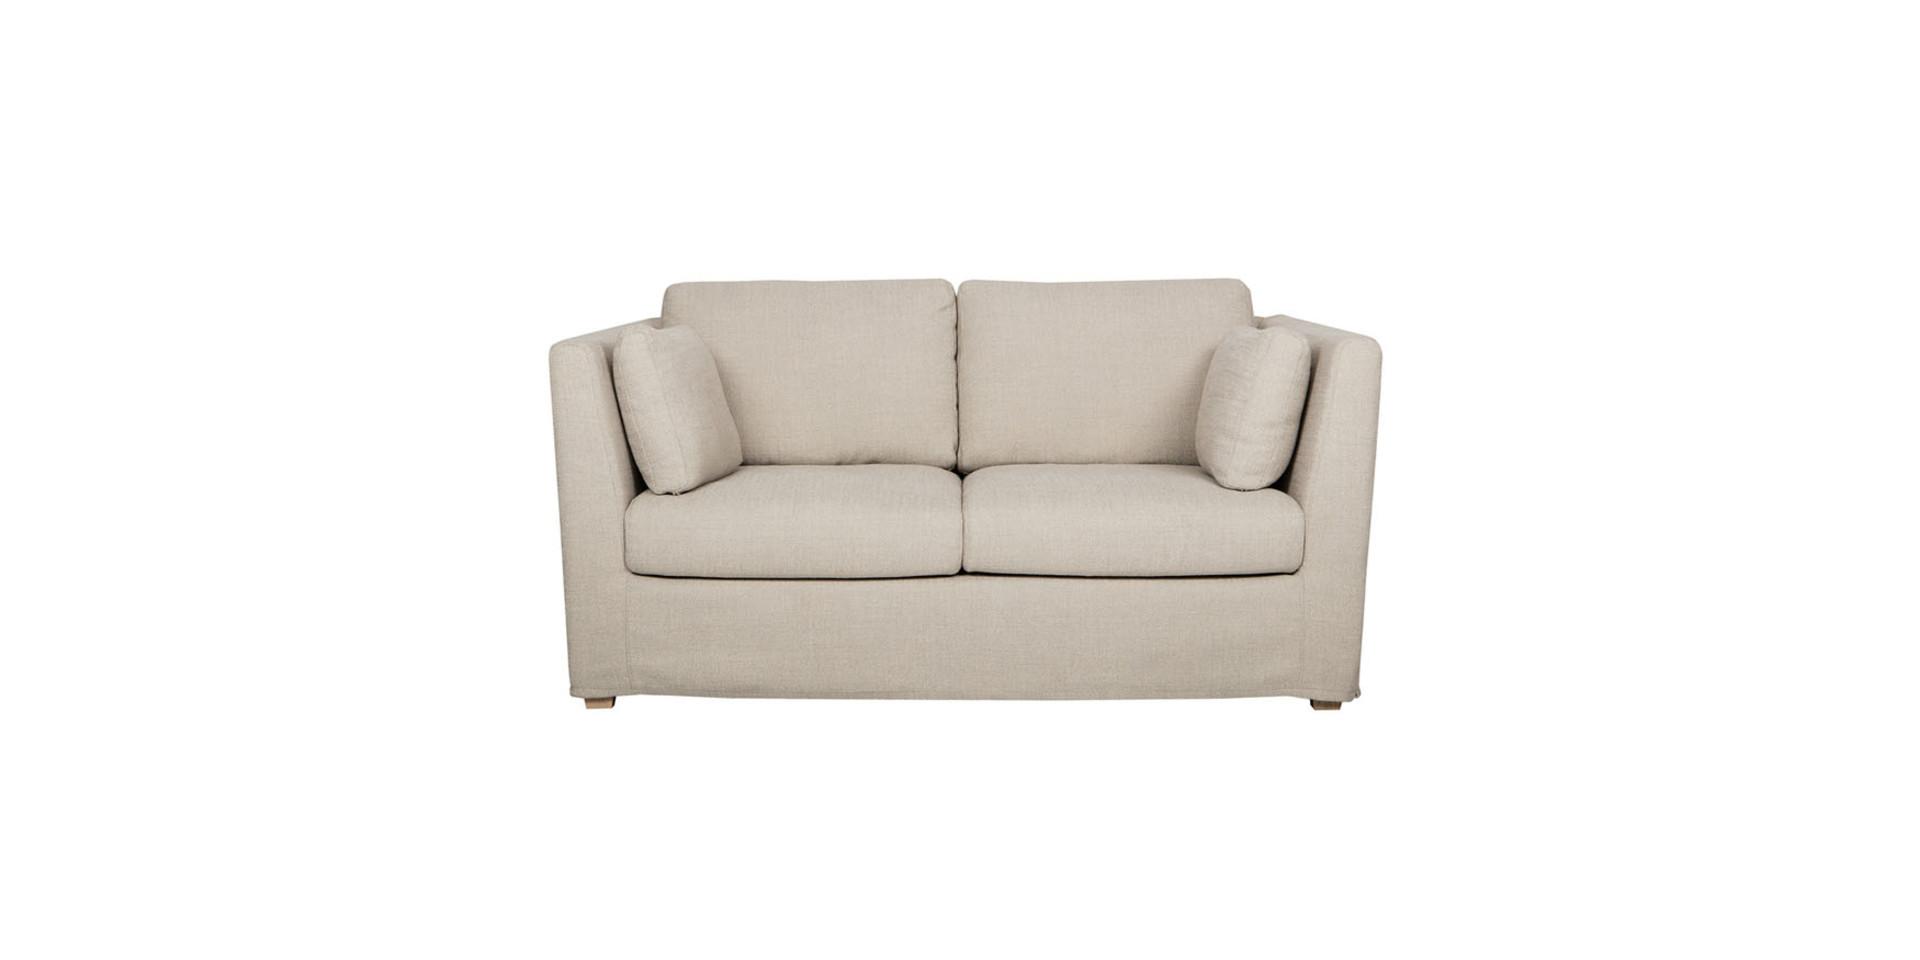 sits-ola-canape-2seater_bermuda1_grey_beige_1